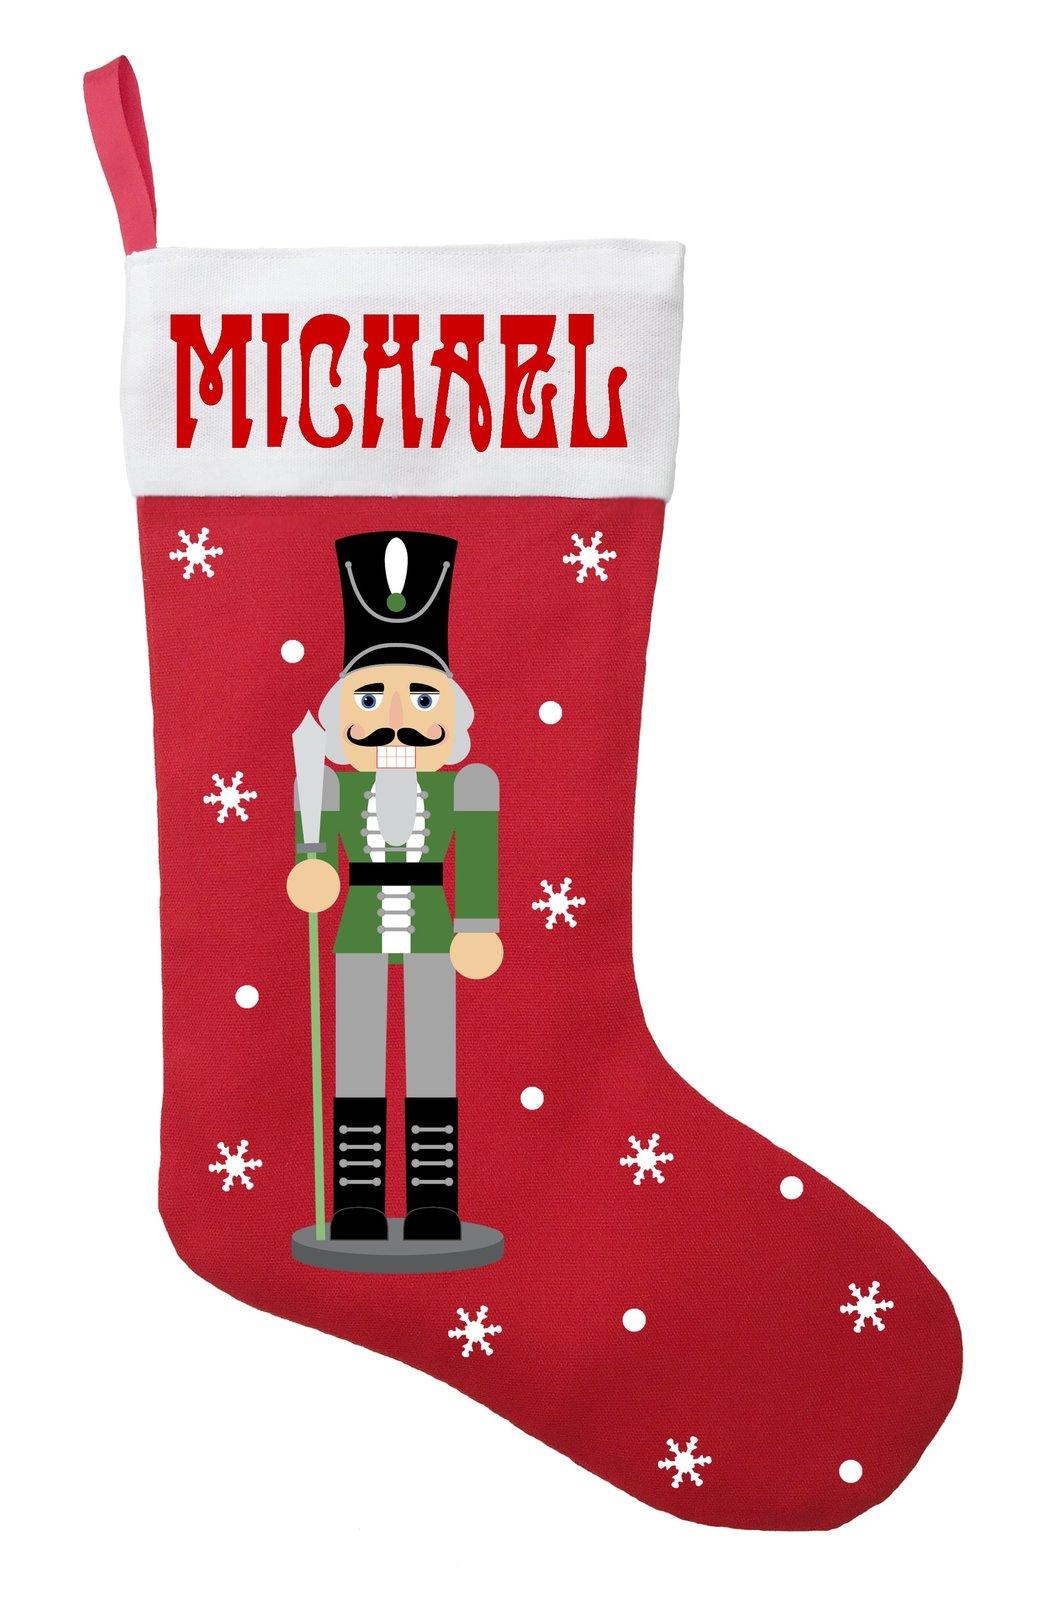 Nutcracker Christmas Stocking - Personalized and Hand Made Nutcracker Stocking i